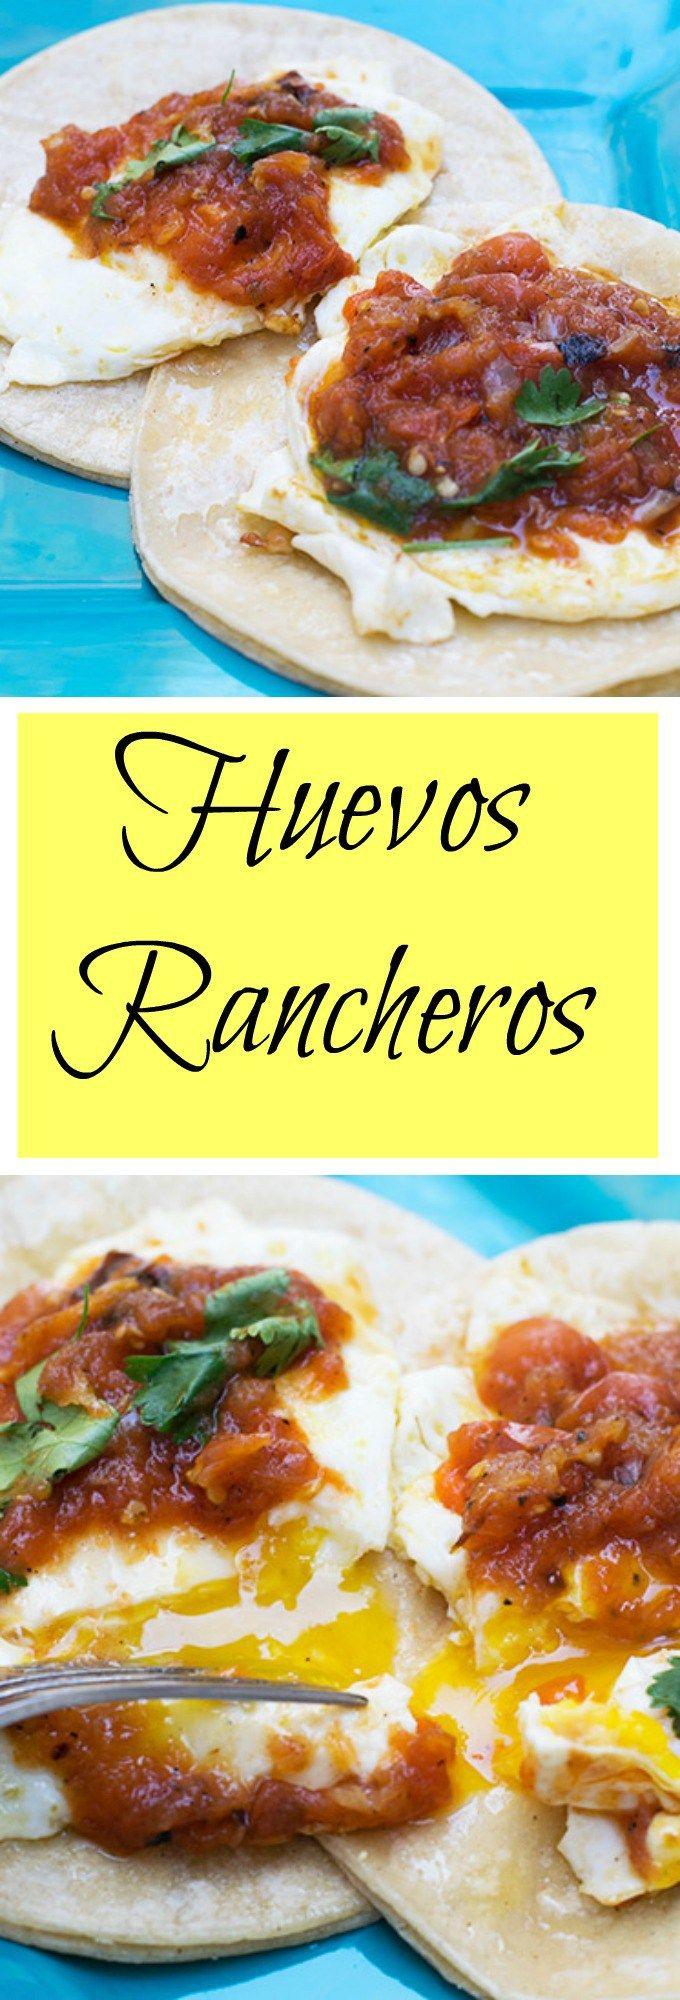 Huevos Rancheros is an easy mexican breakfast full of flavor.